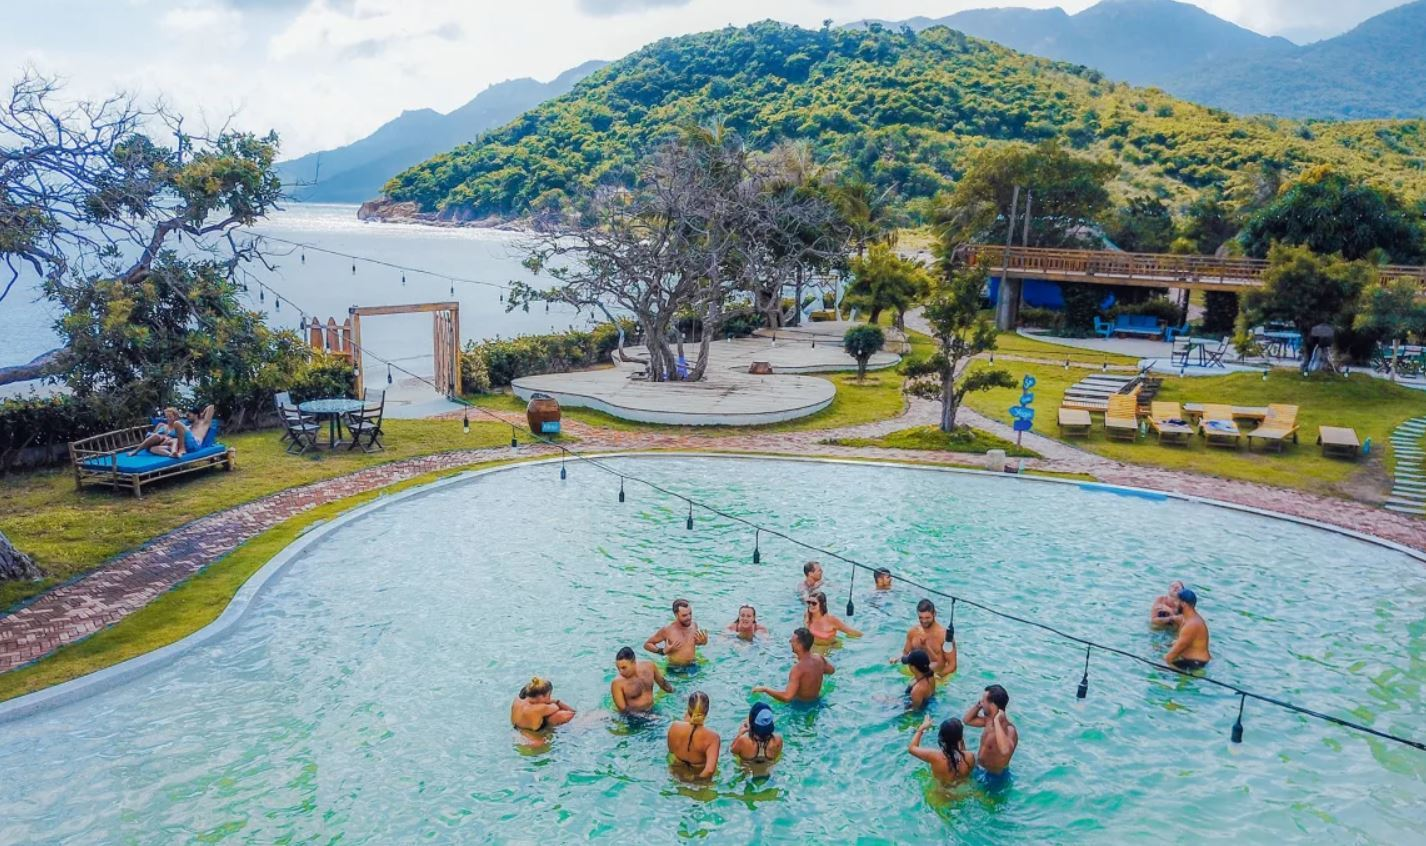 Ninhvana Nha Trang Backpackers best hostels in Nha Trang